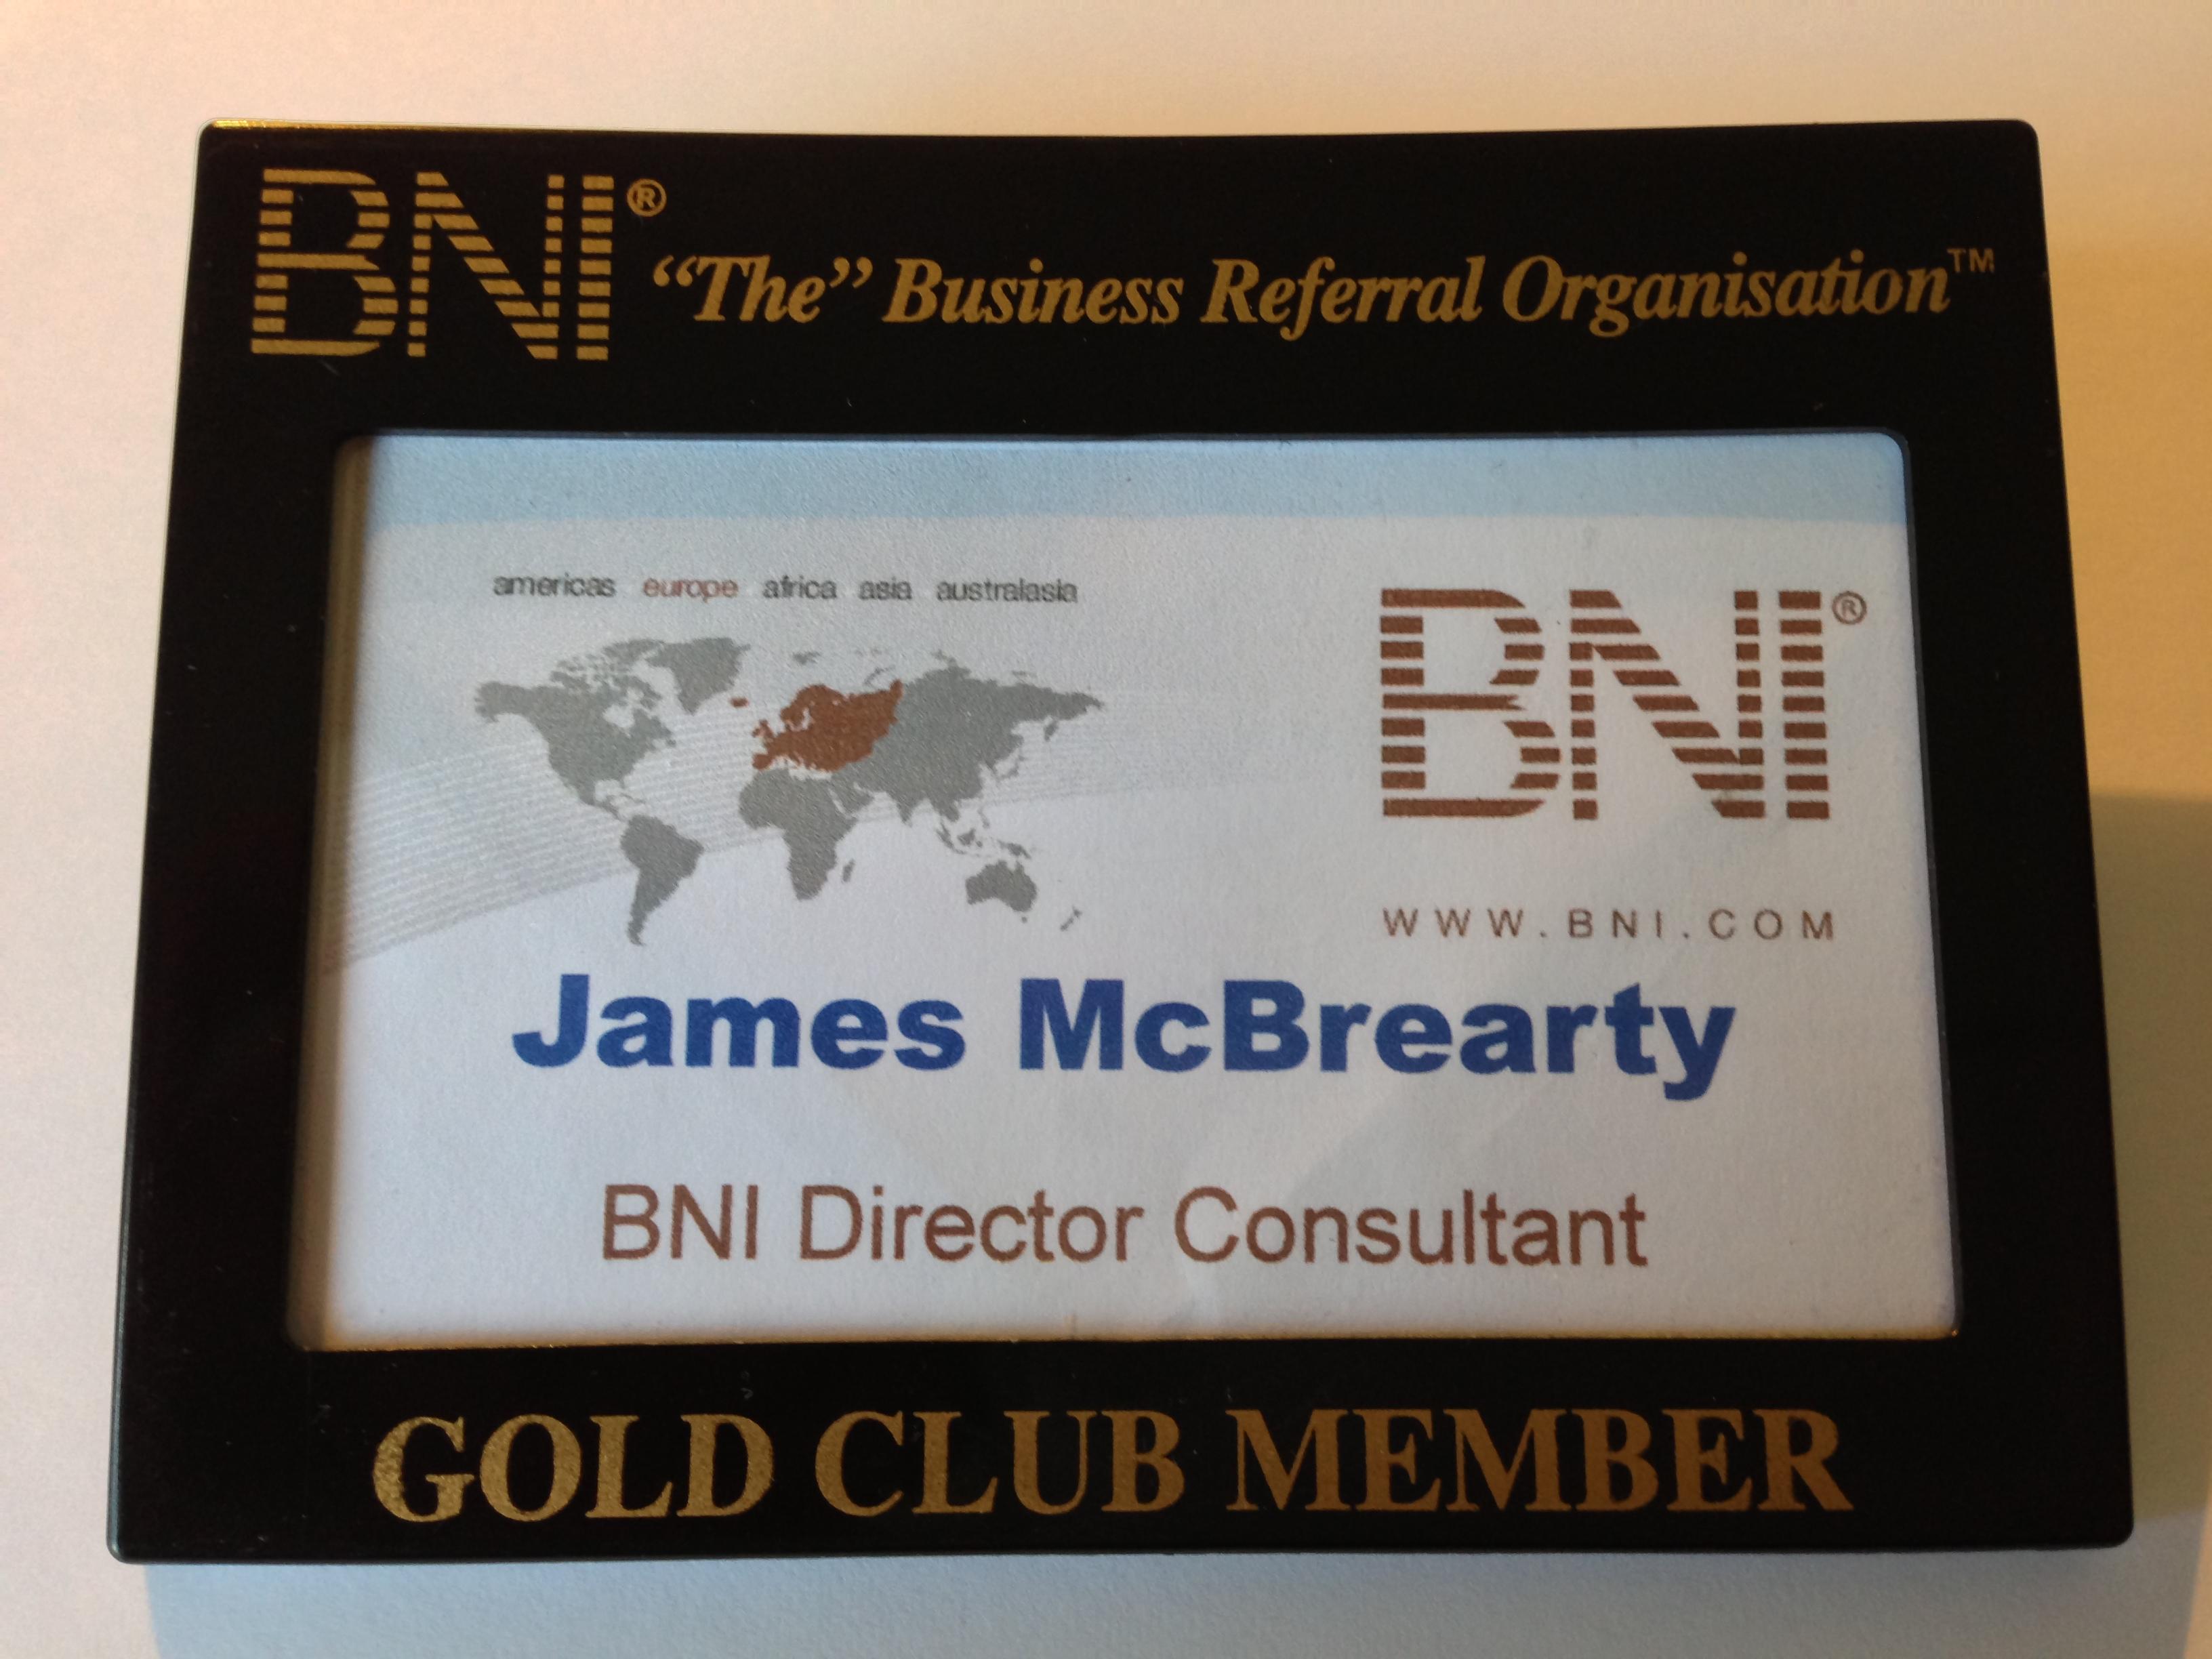 BNI Director Consultant Gold Club Member